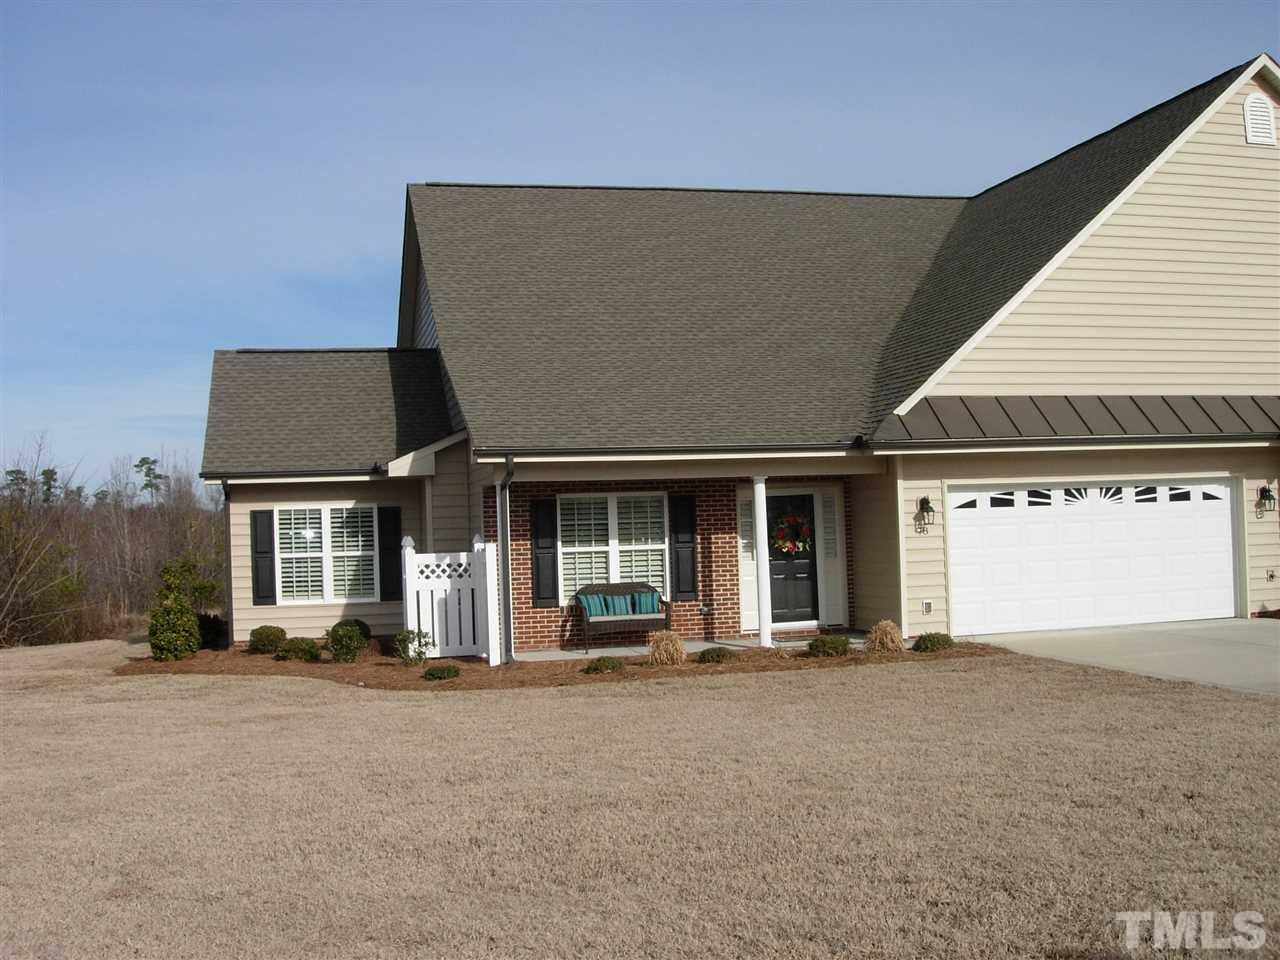 78 Glenfield Drive Dunn, NC 28334 2170007